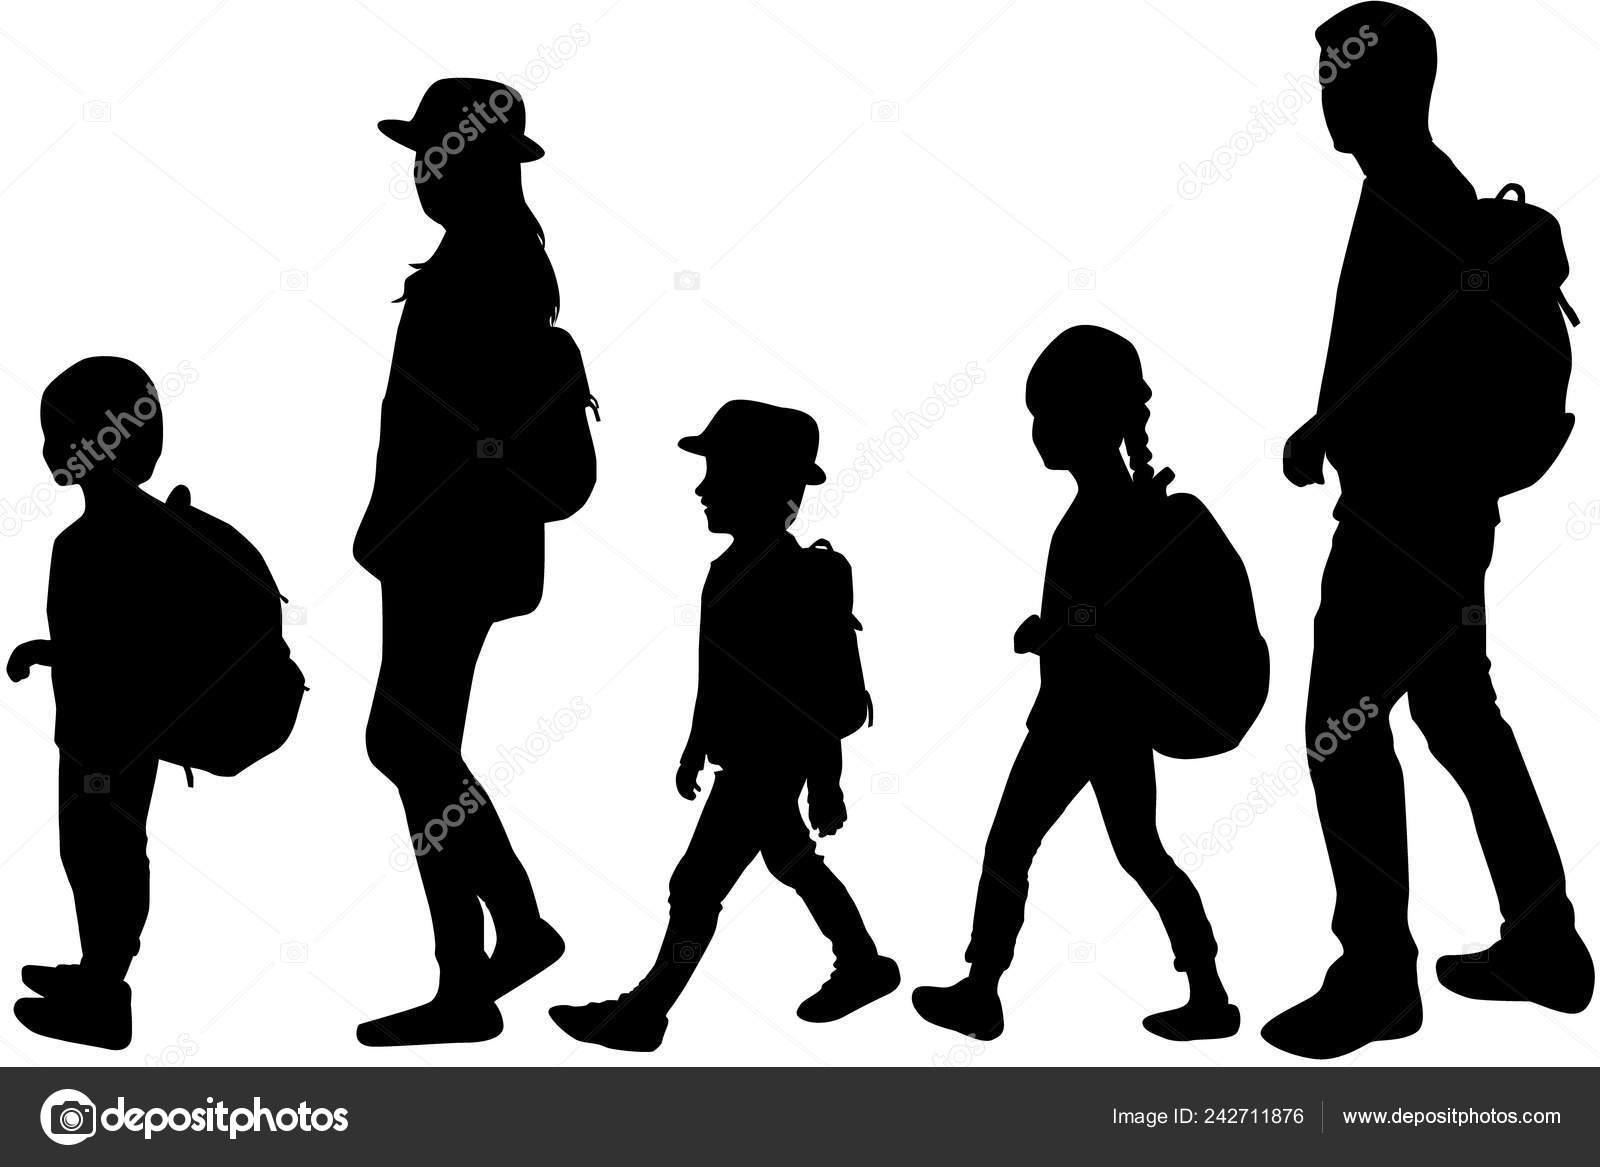 silhouette family walk vector work stock vector c pablonis 242711876 silhouette family walk vector work stock vector c pablonis 242711876